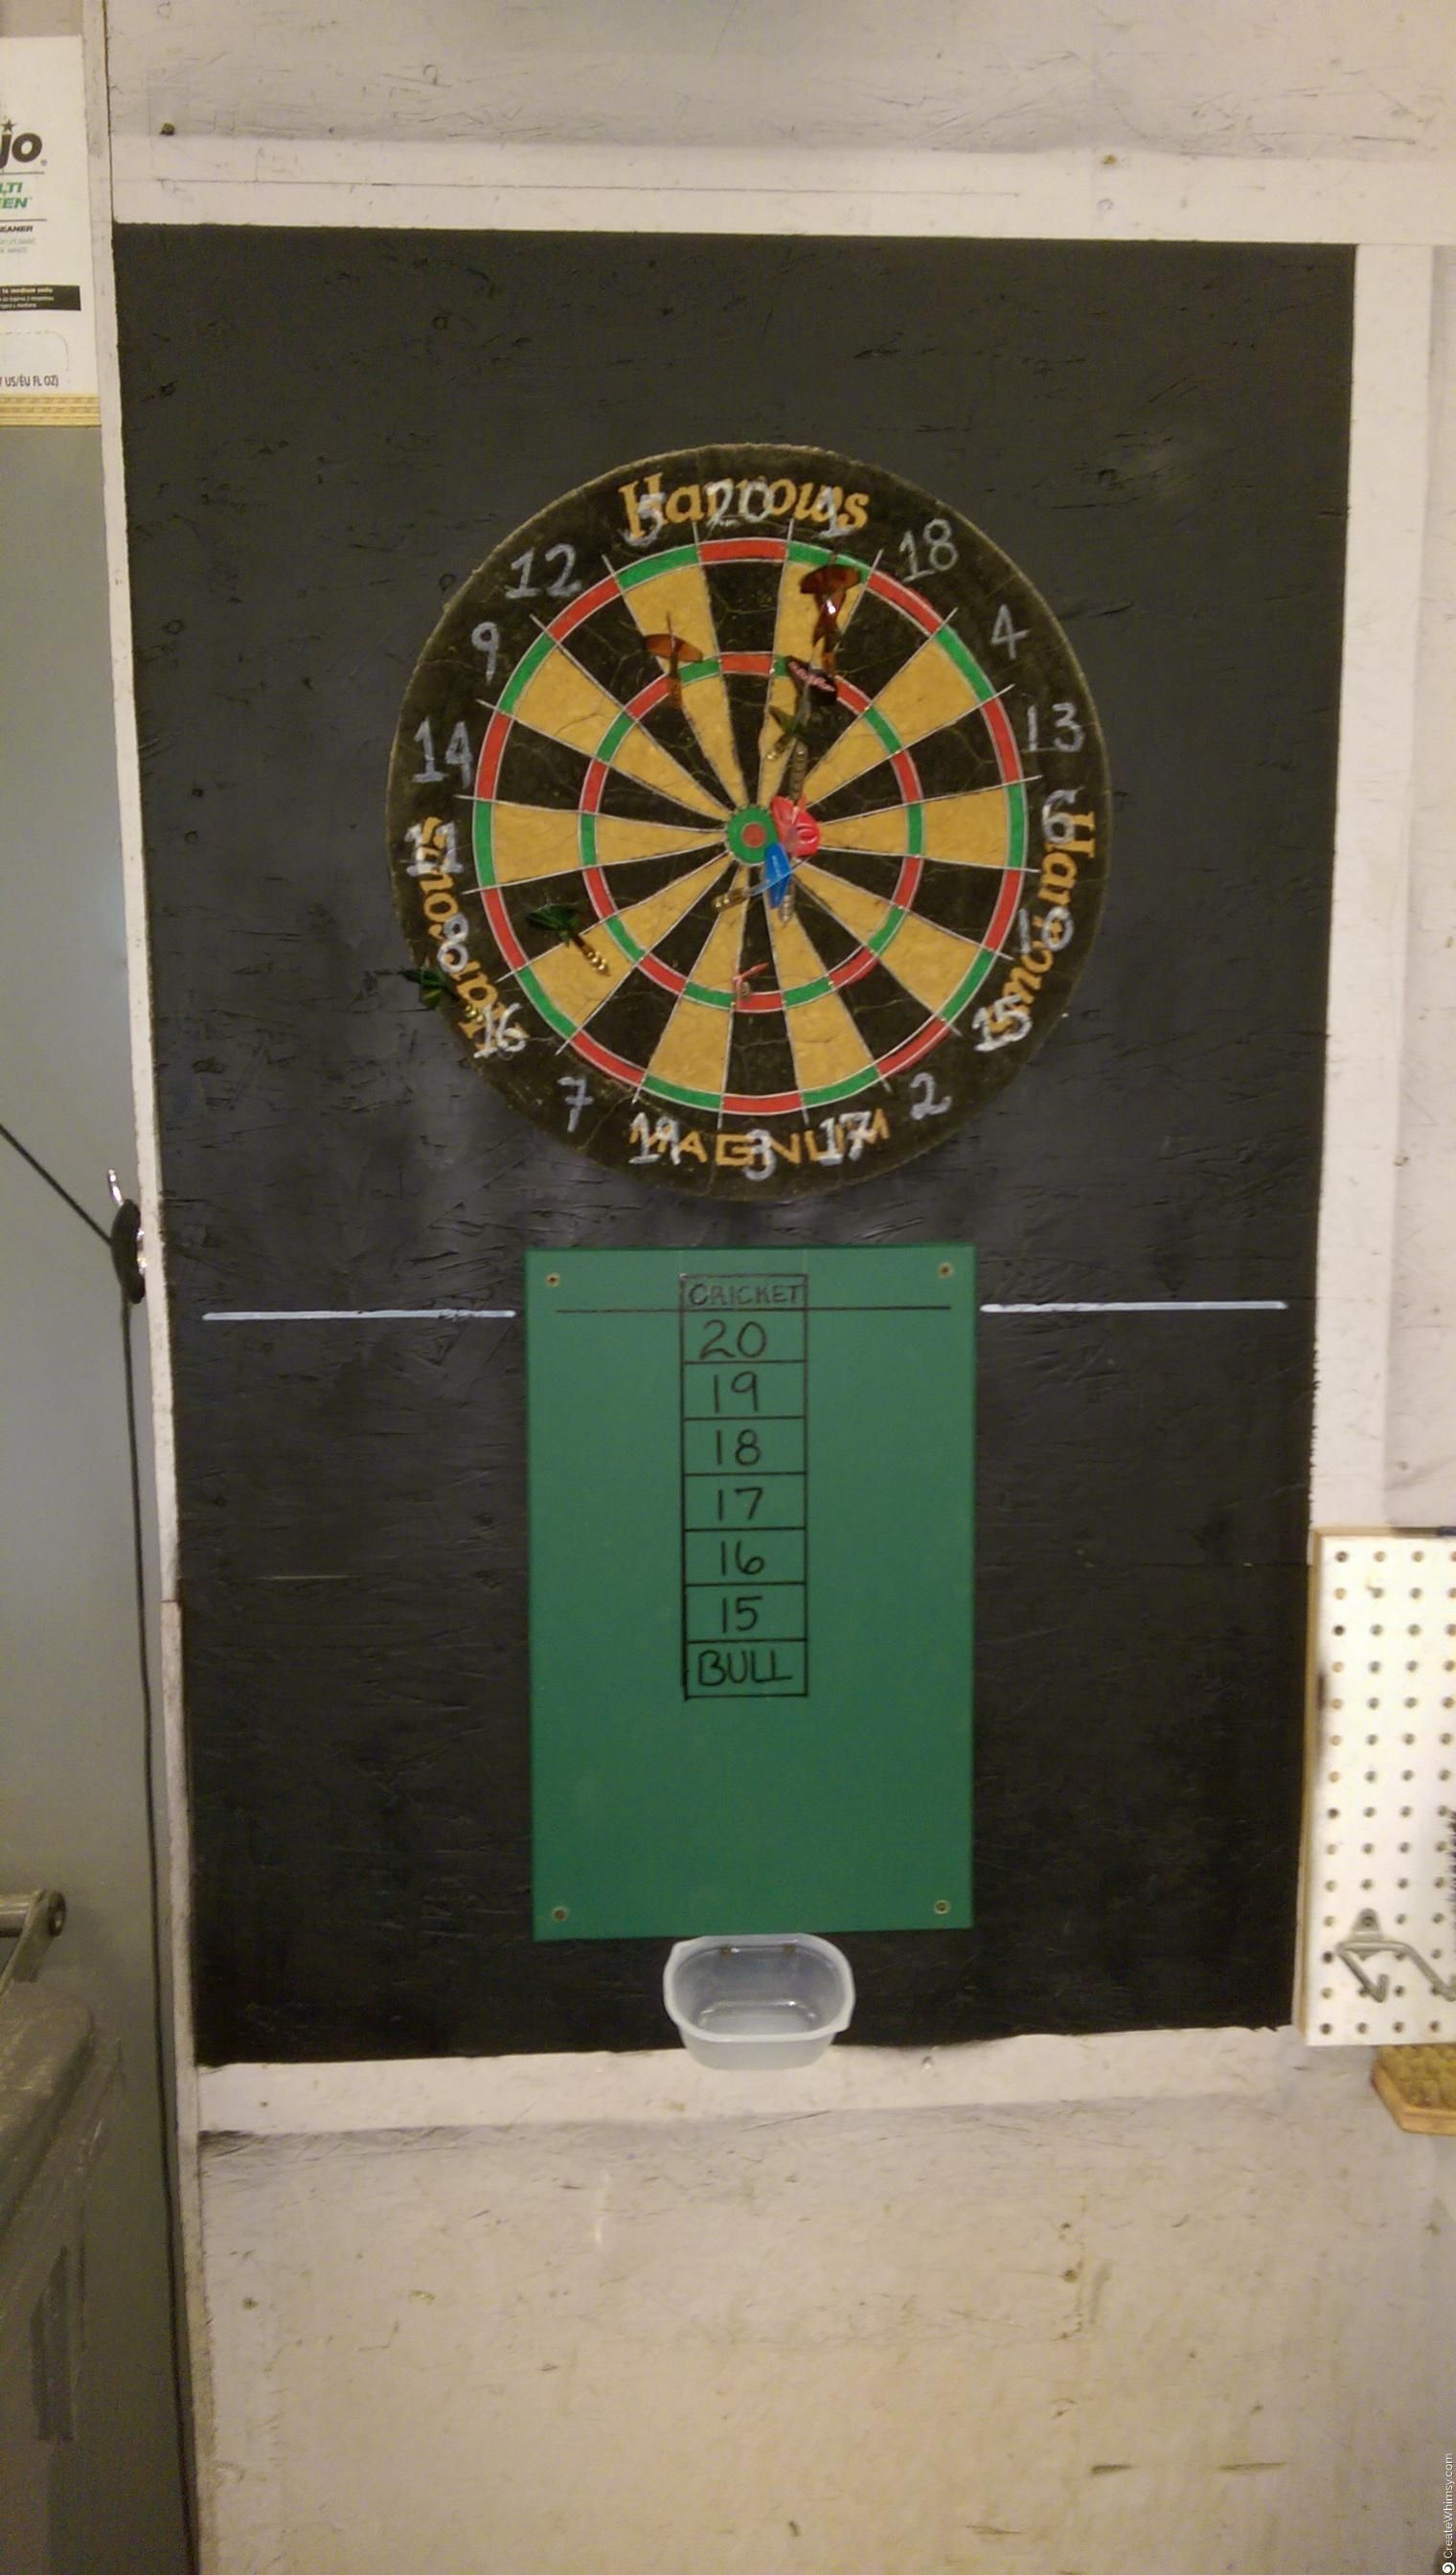 Make your own dart board! Cricket score board, chalk cup